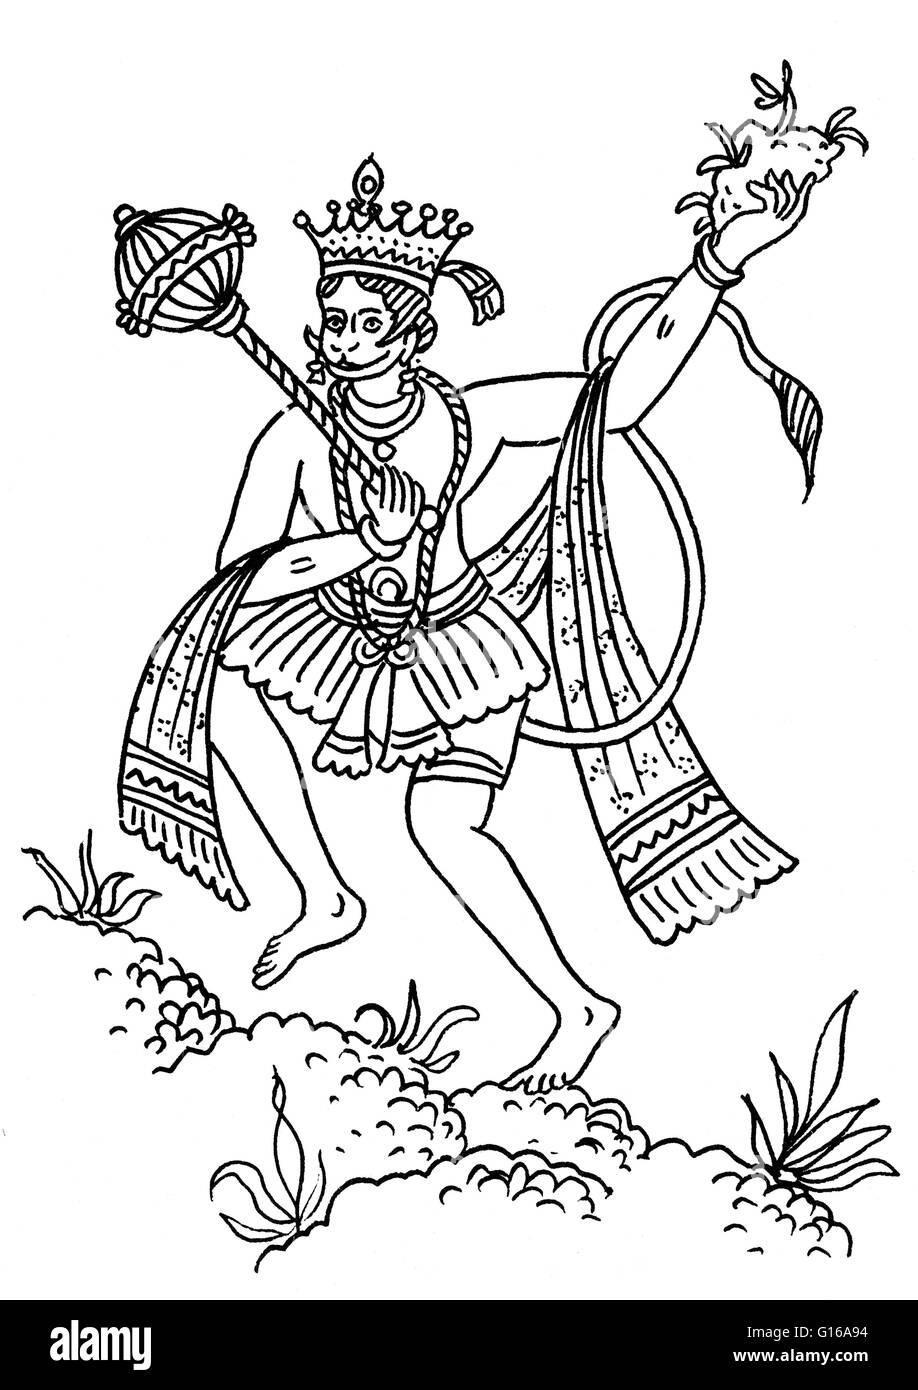 Hanuman transporting the medicinal mountain. Hanuman, together with Ganesha and Garuda, is one of the three principal - Stock Image